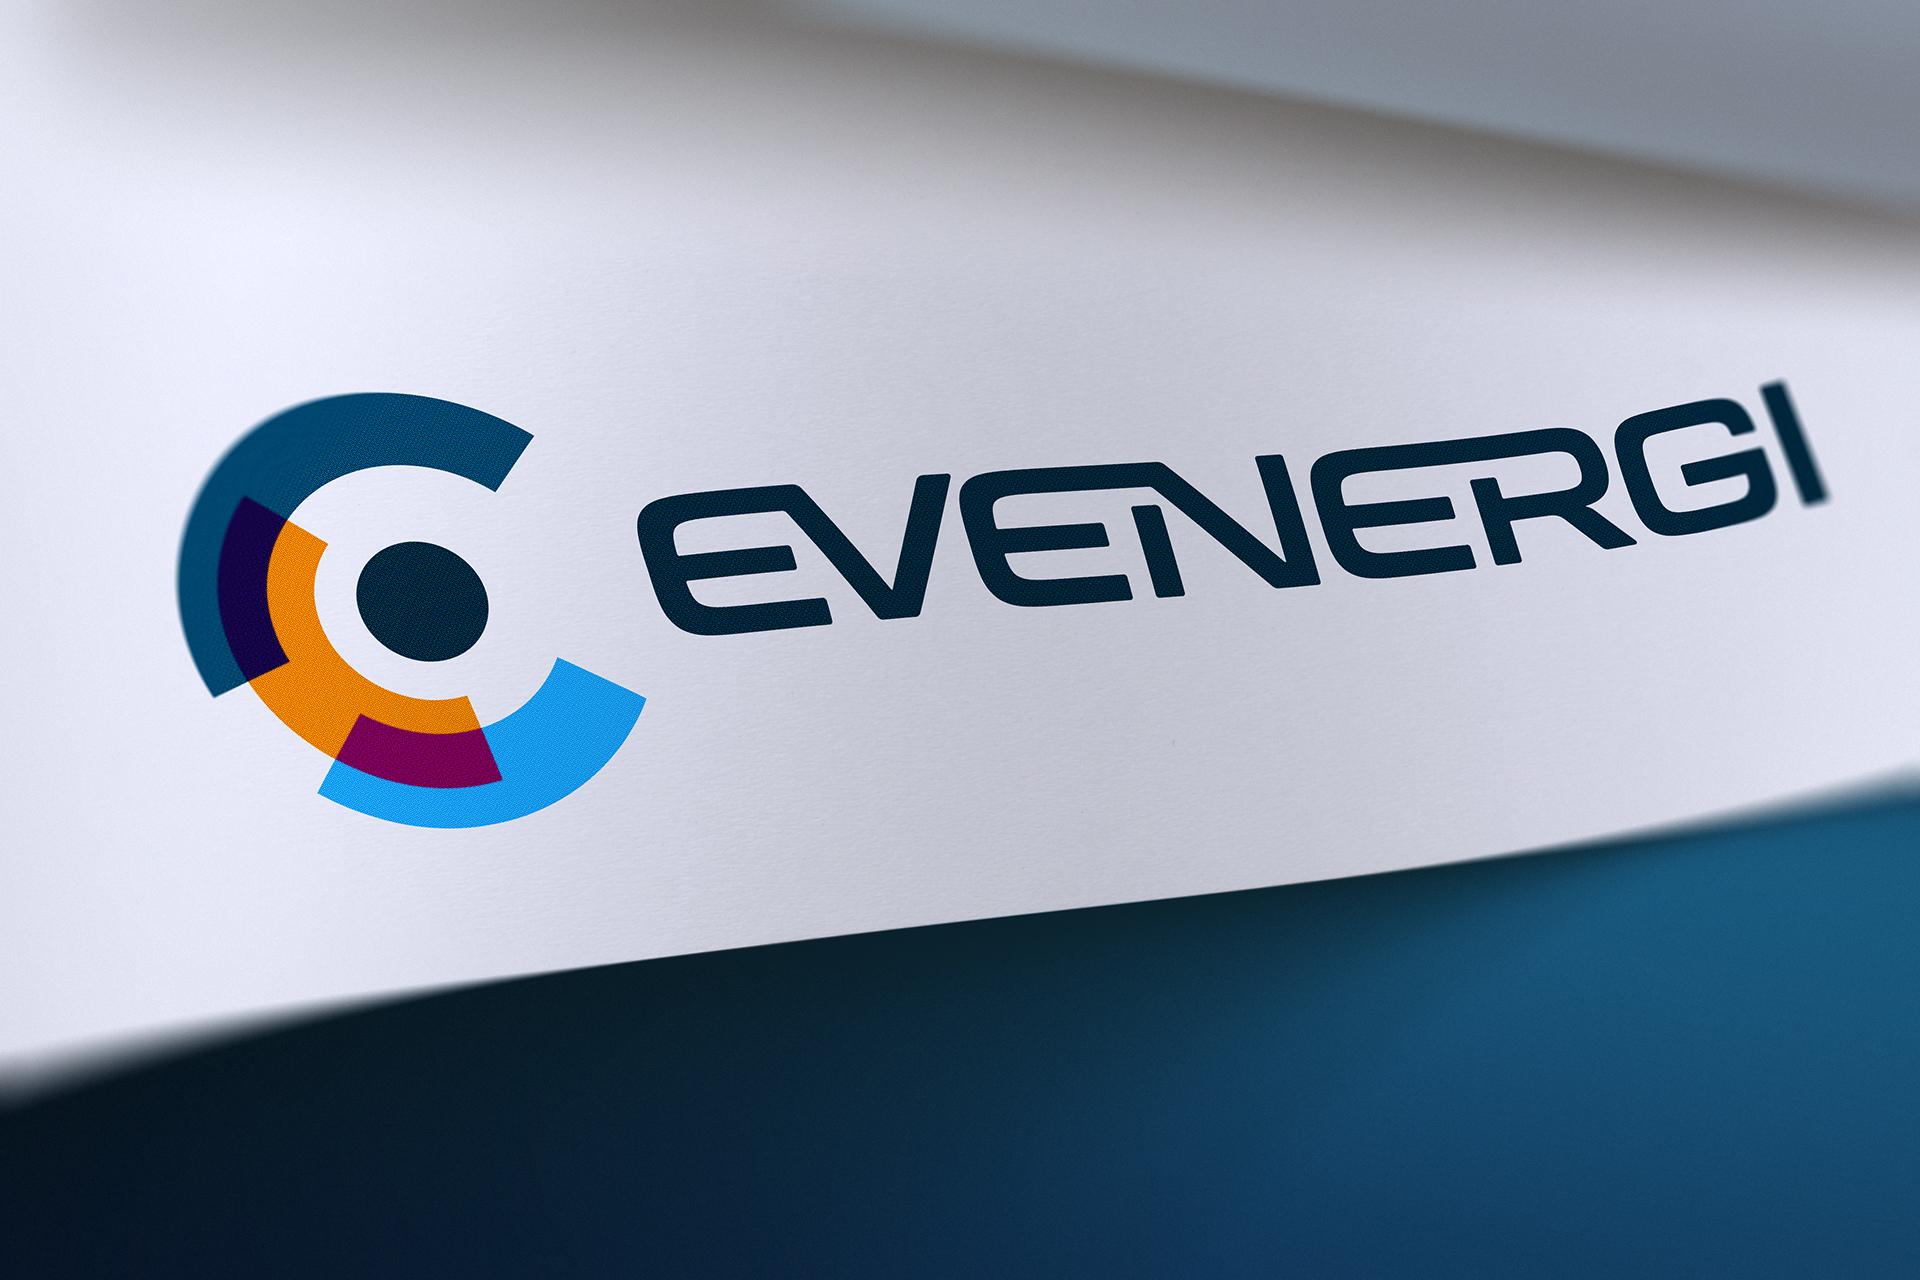 The Evenergi renewables brand represents a contemporary next generation automotive identity, built for the future.